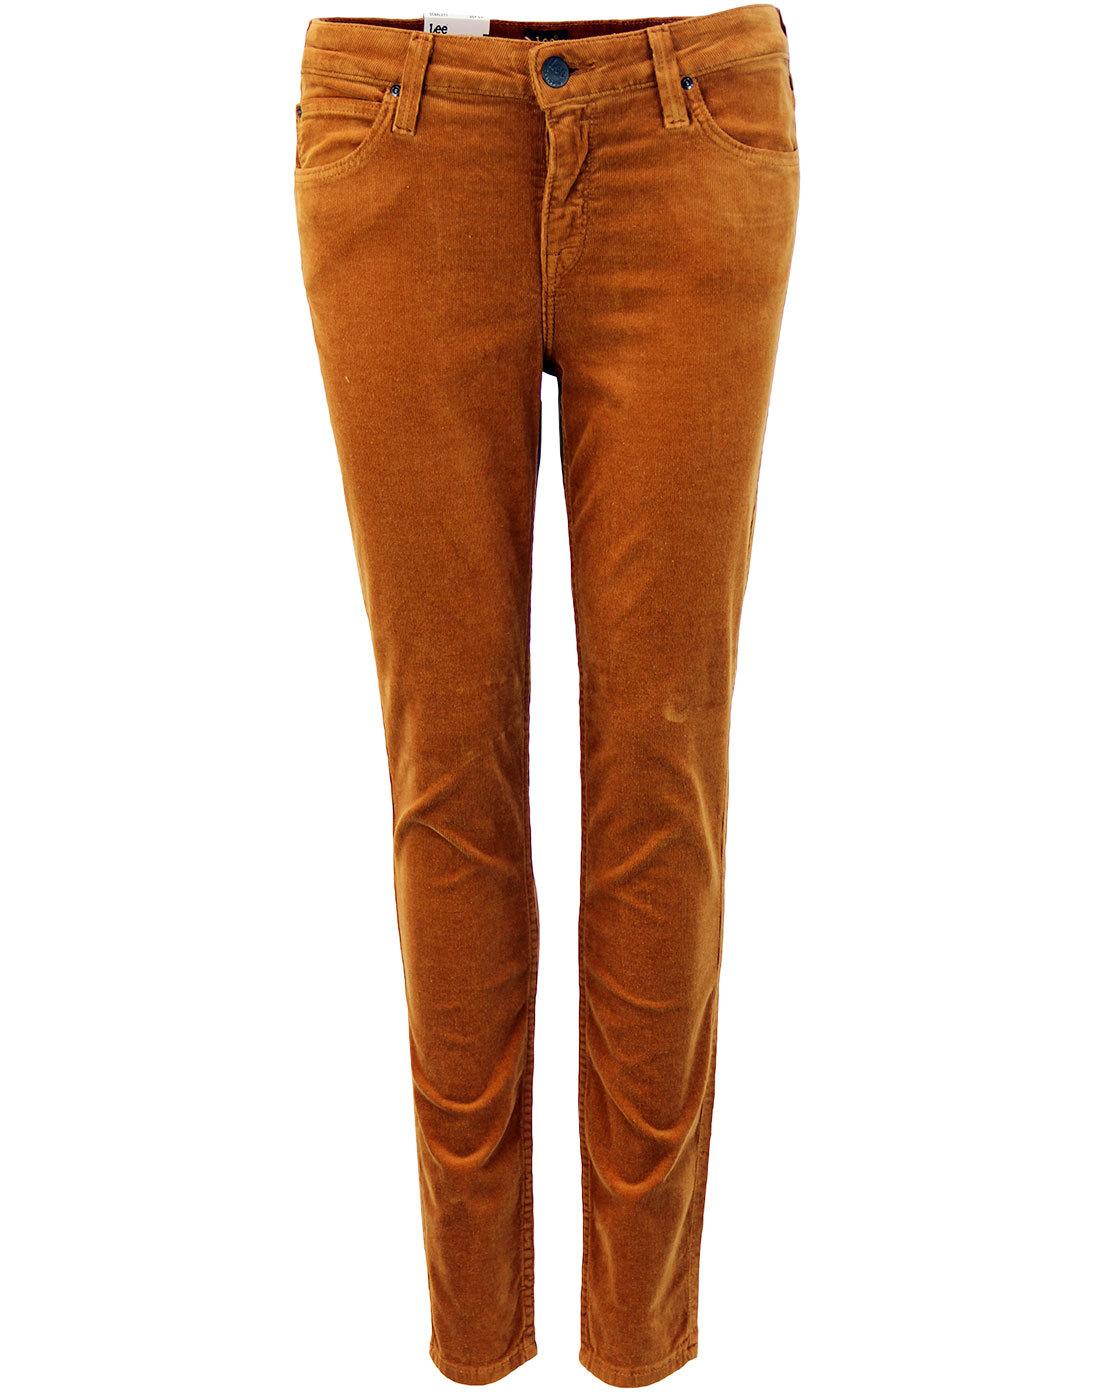 Scarlett LEE Retro Womens Cord Skinny Jeans Cognac